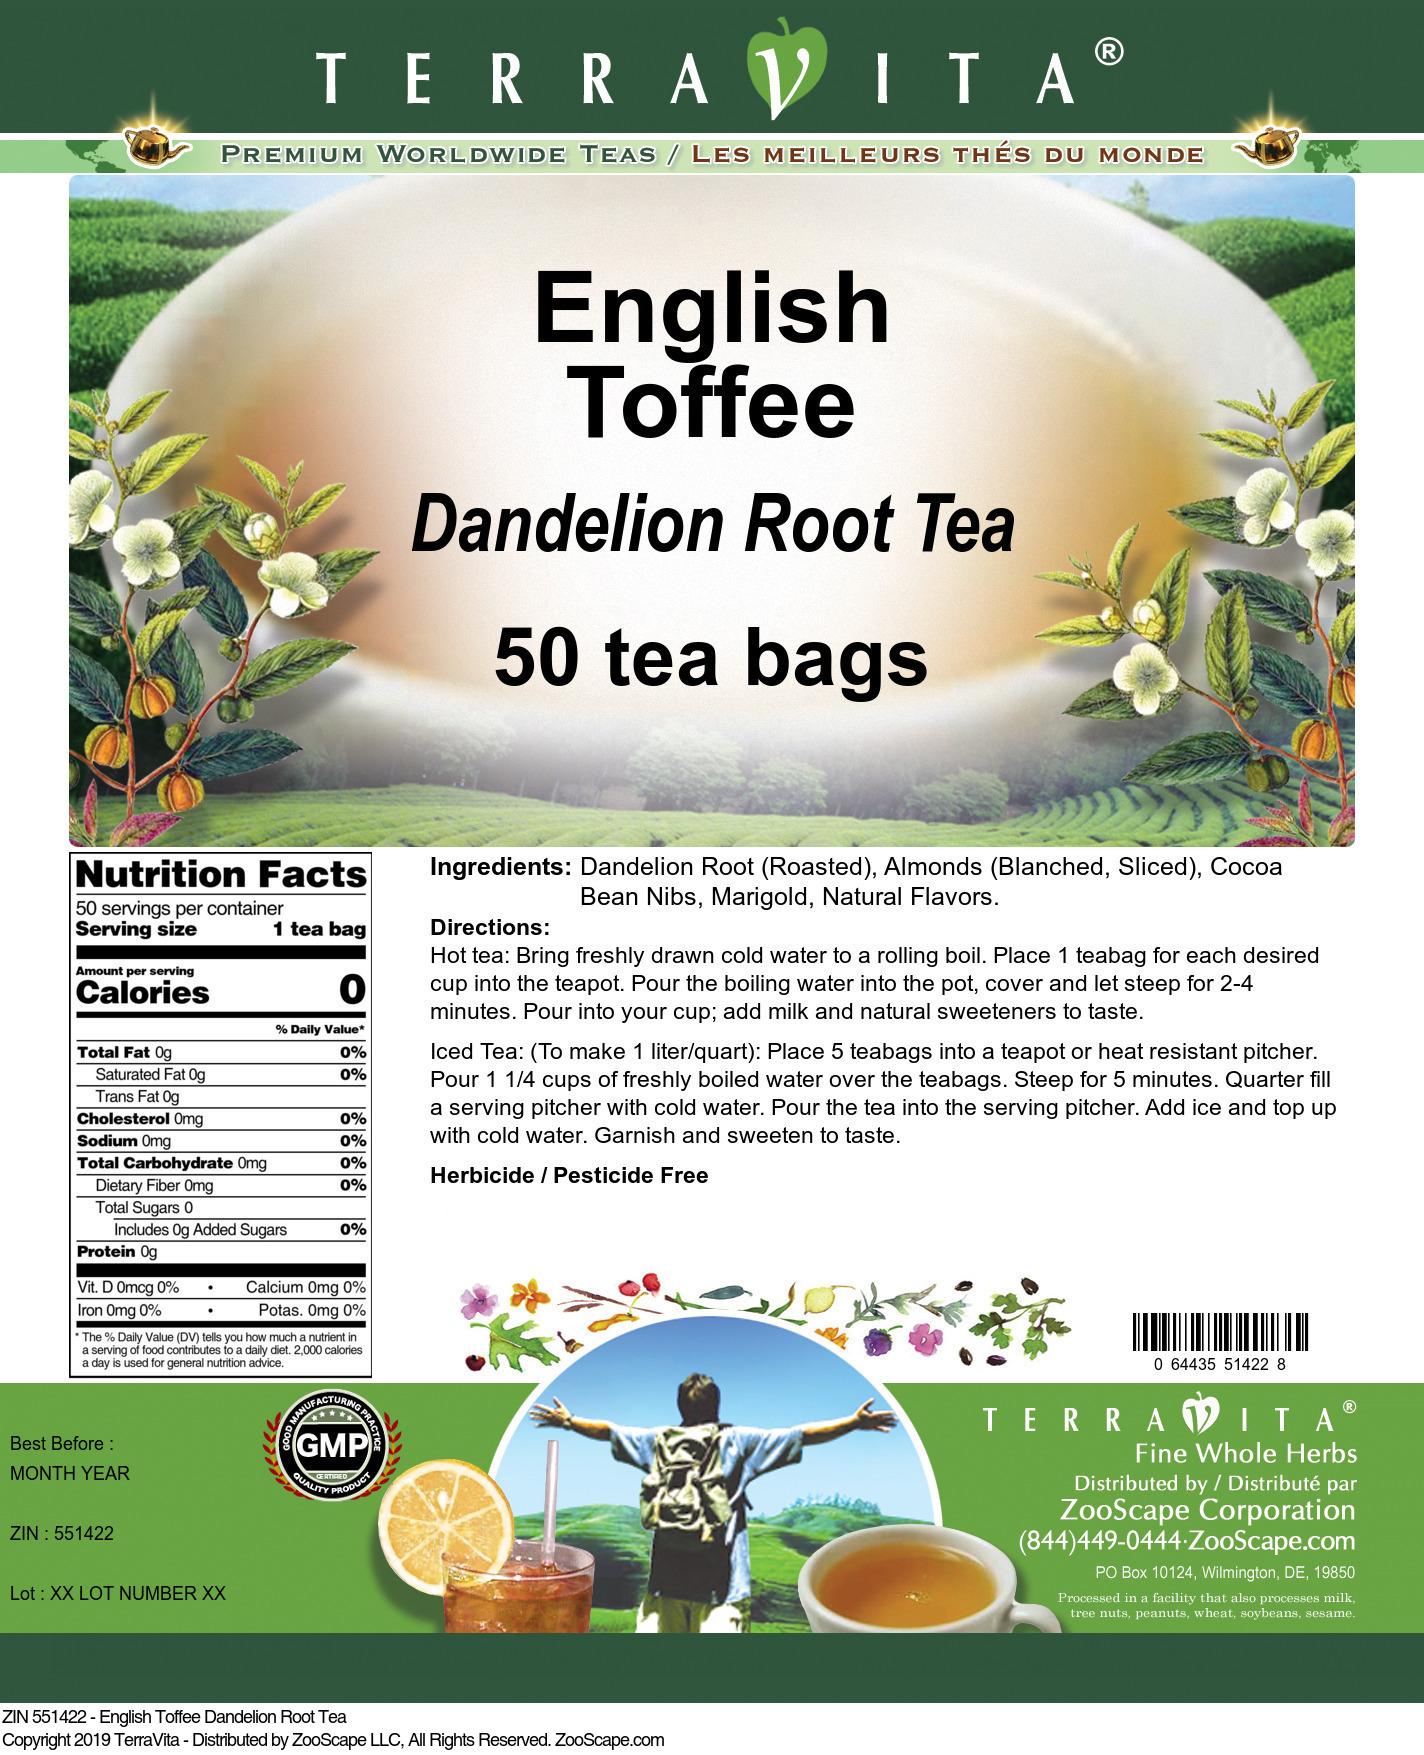 English Toffee Dandelion Root Tea